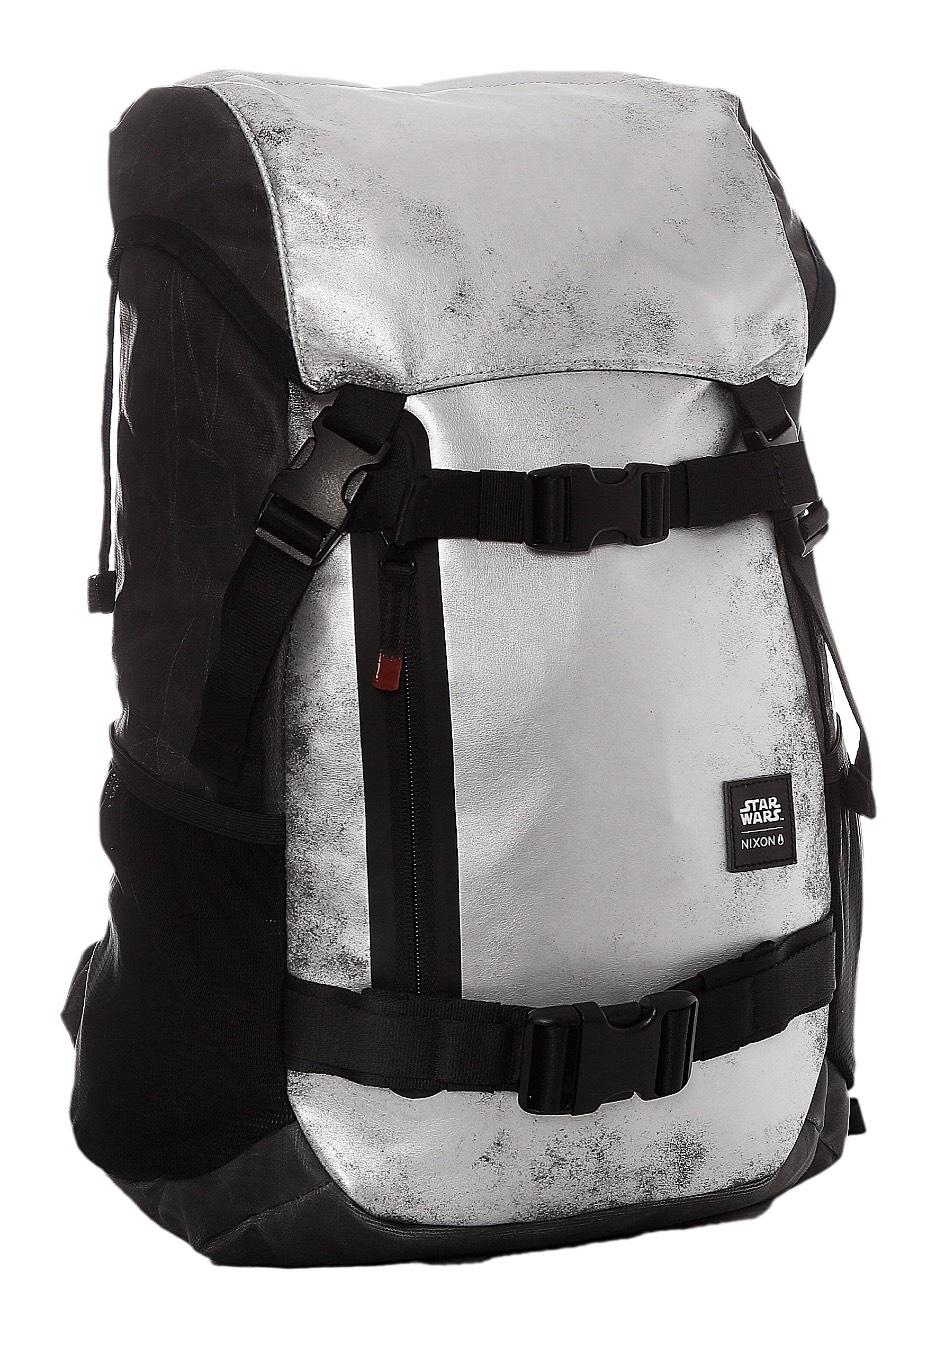 49d0652b899 Nixon x Star Wars - Landlock SW Phasma Silver - Backpack - Impericon.com UK